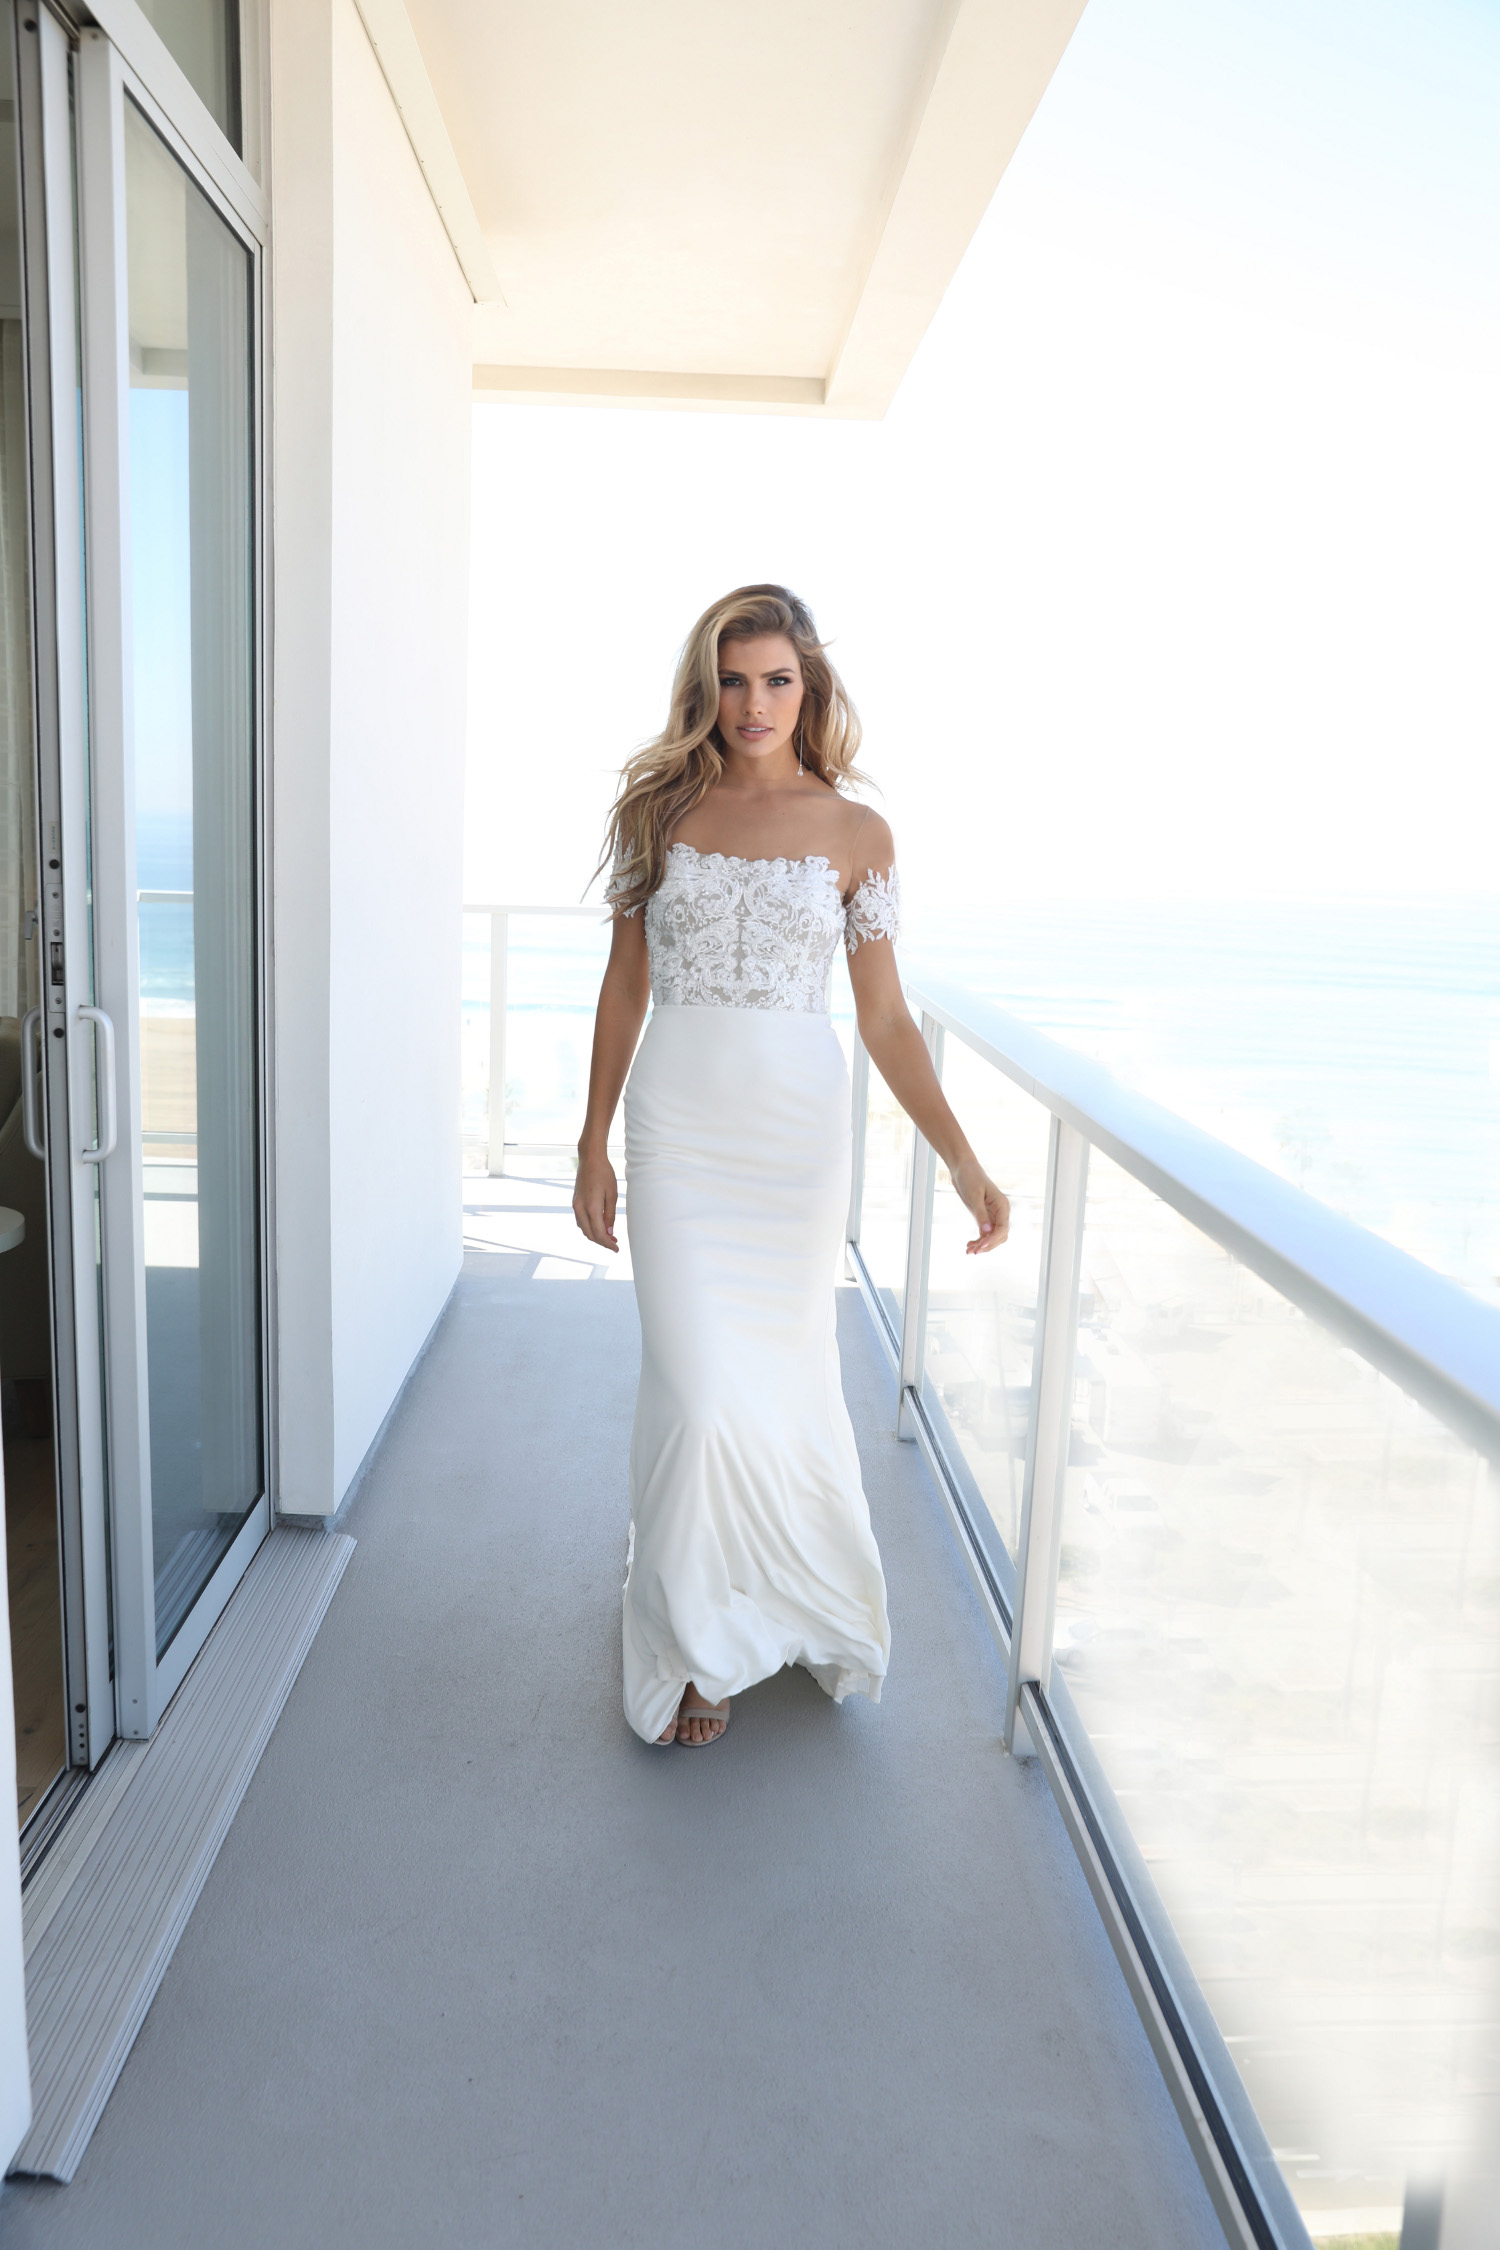 Erin Cole - Audrey2 - Brautsalat